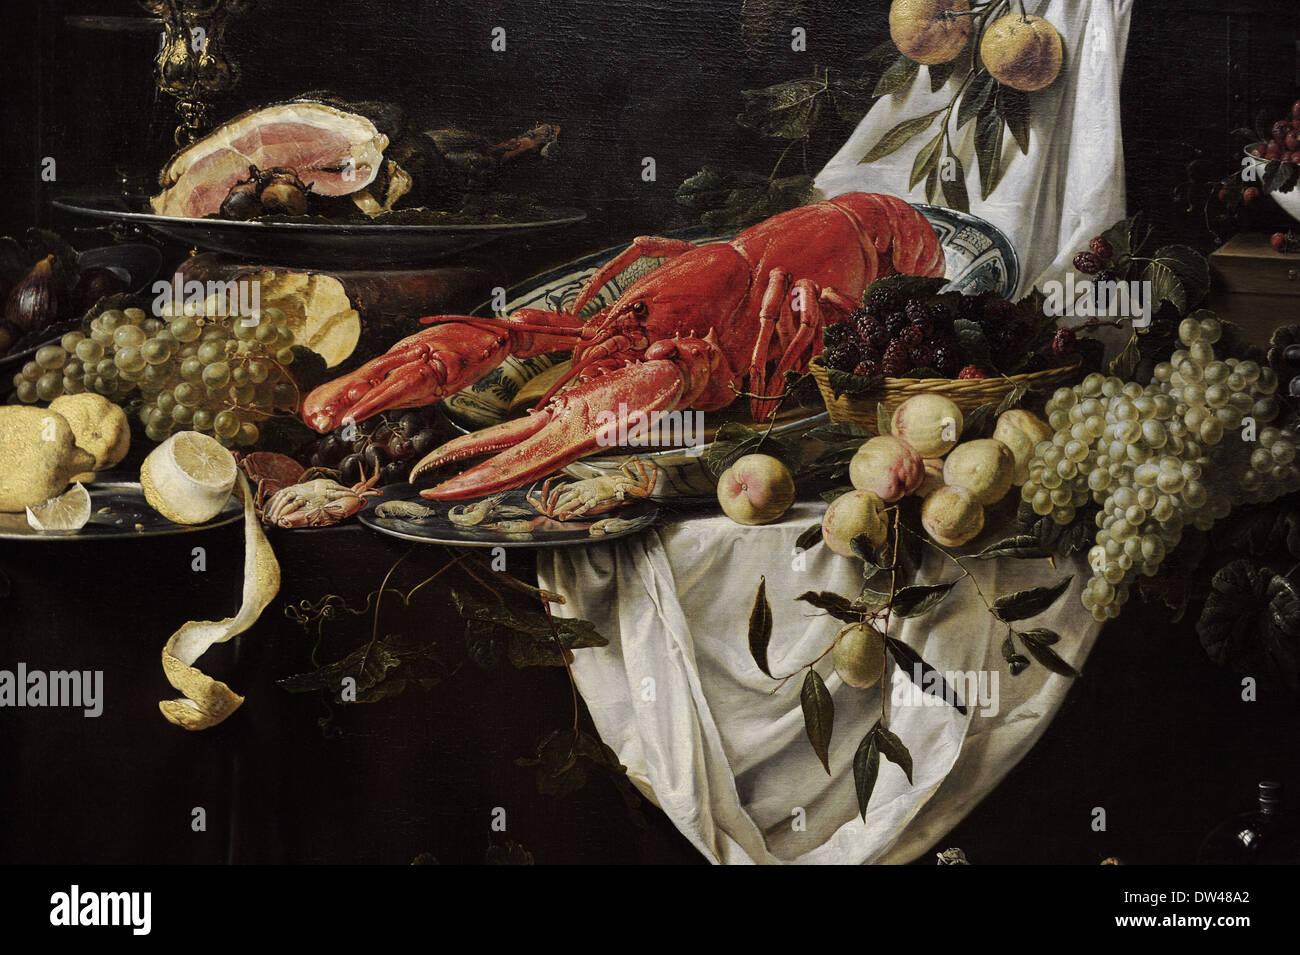 Adriaen van Utrecht (1599-1651/52). El pintor flamenco. Banquete Still Life, 1644. Detalle. Rijksmuseum. Amsterdam. Holland. Imagen De Stock